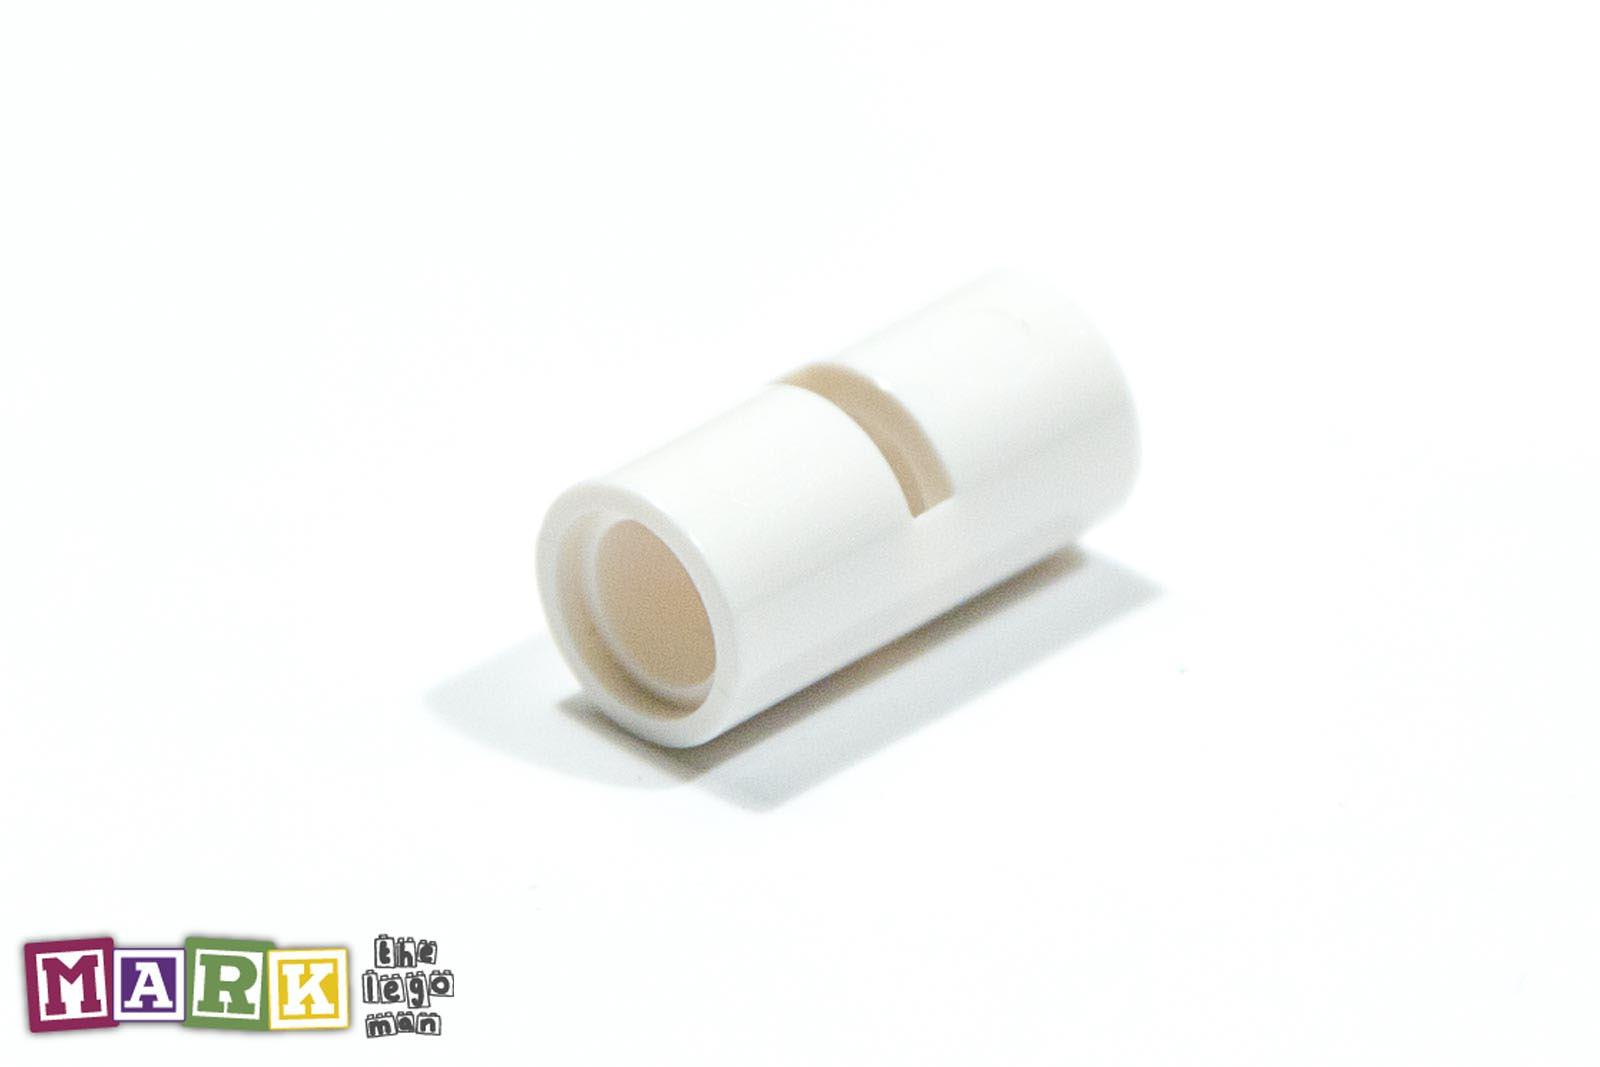 Lego Ø connector tube with double hole